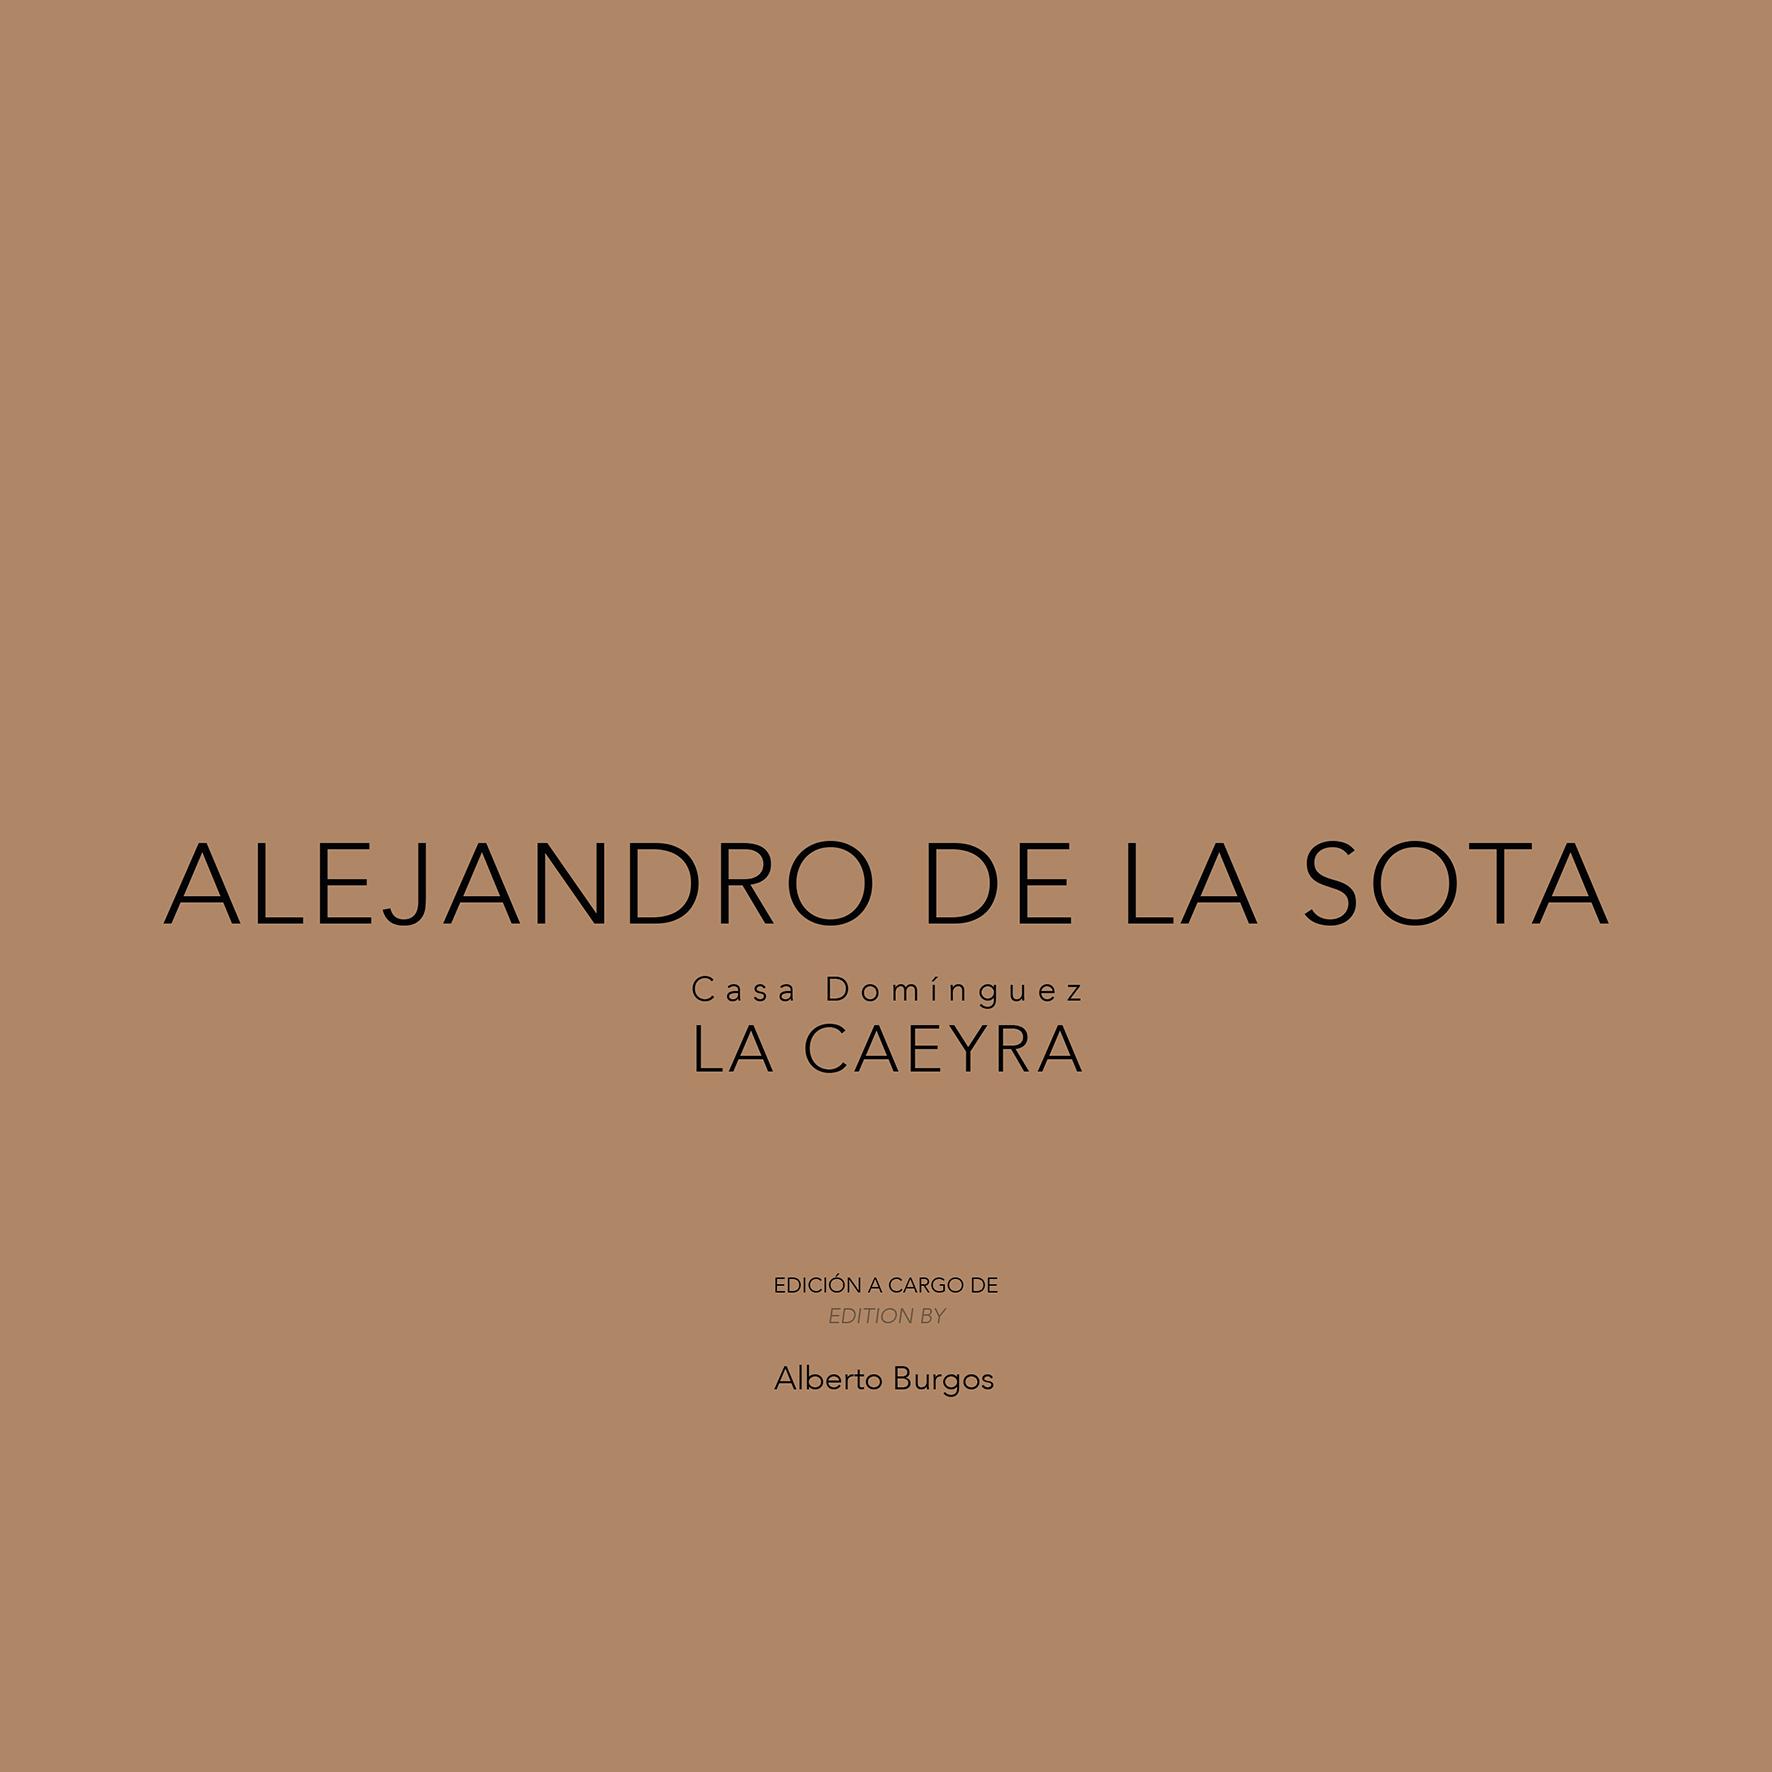 La Caeyra CC.indd